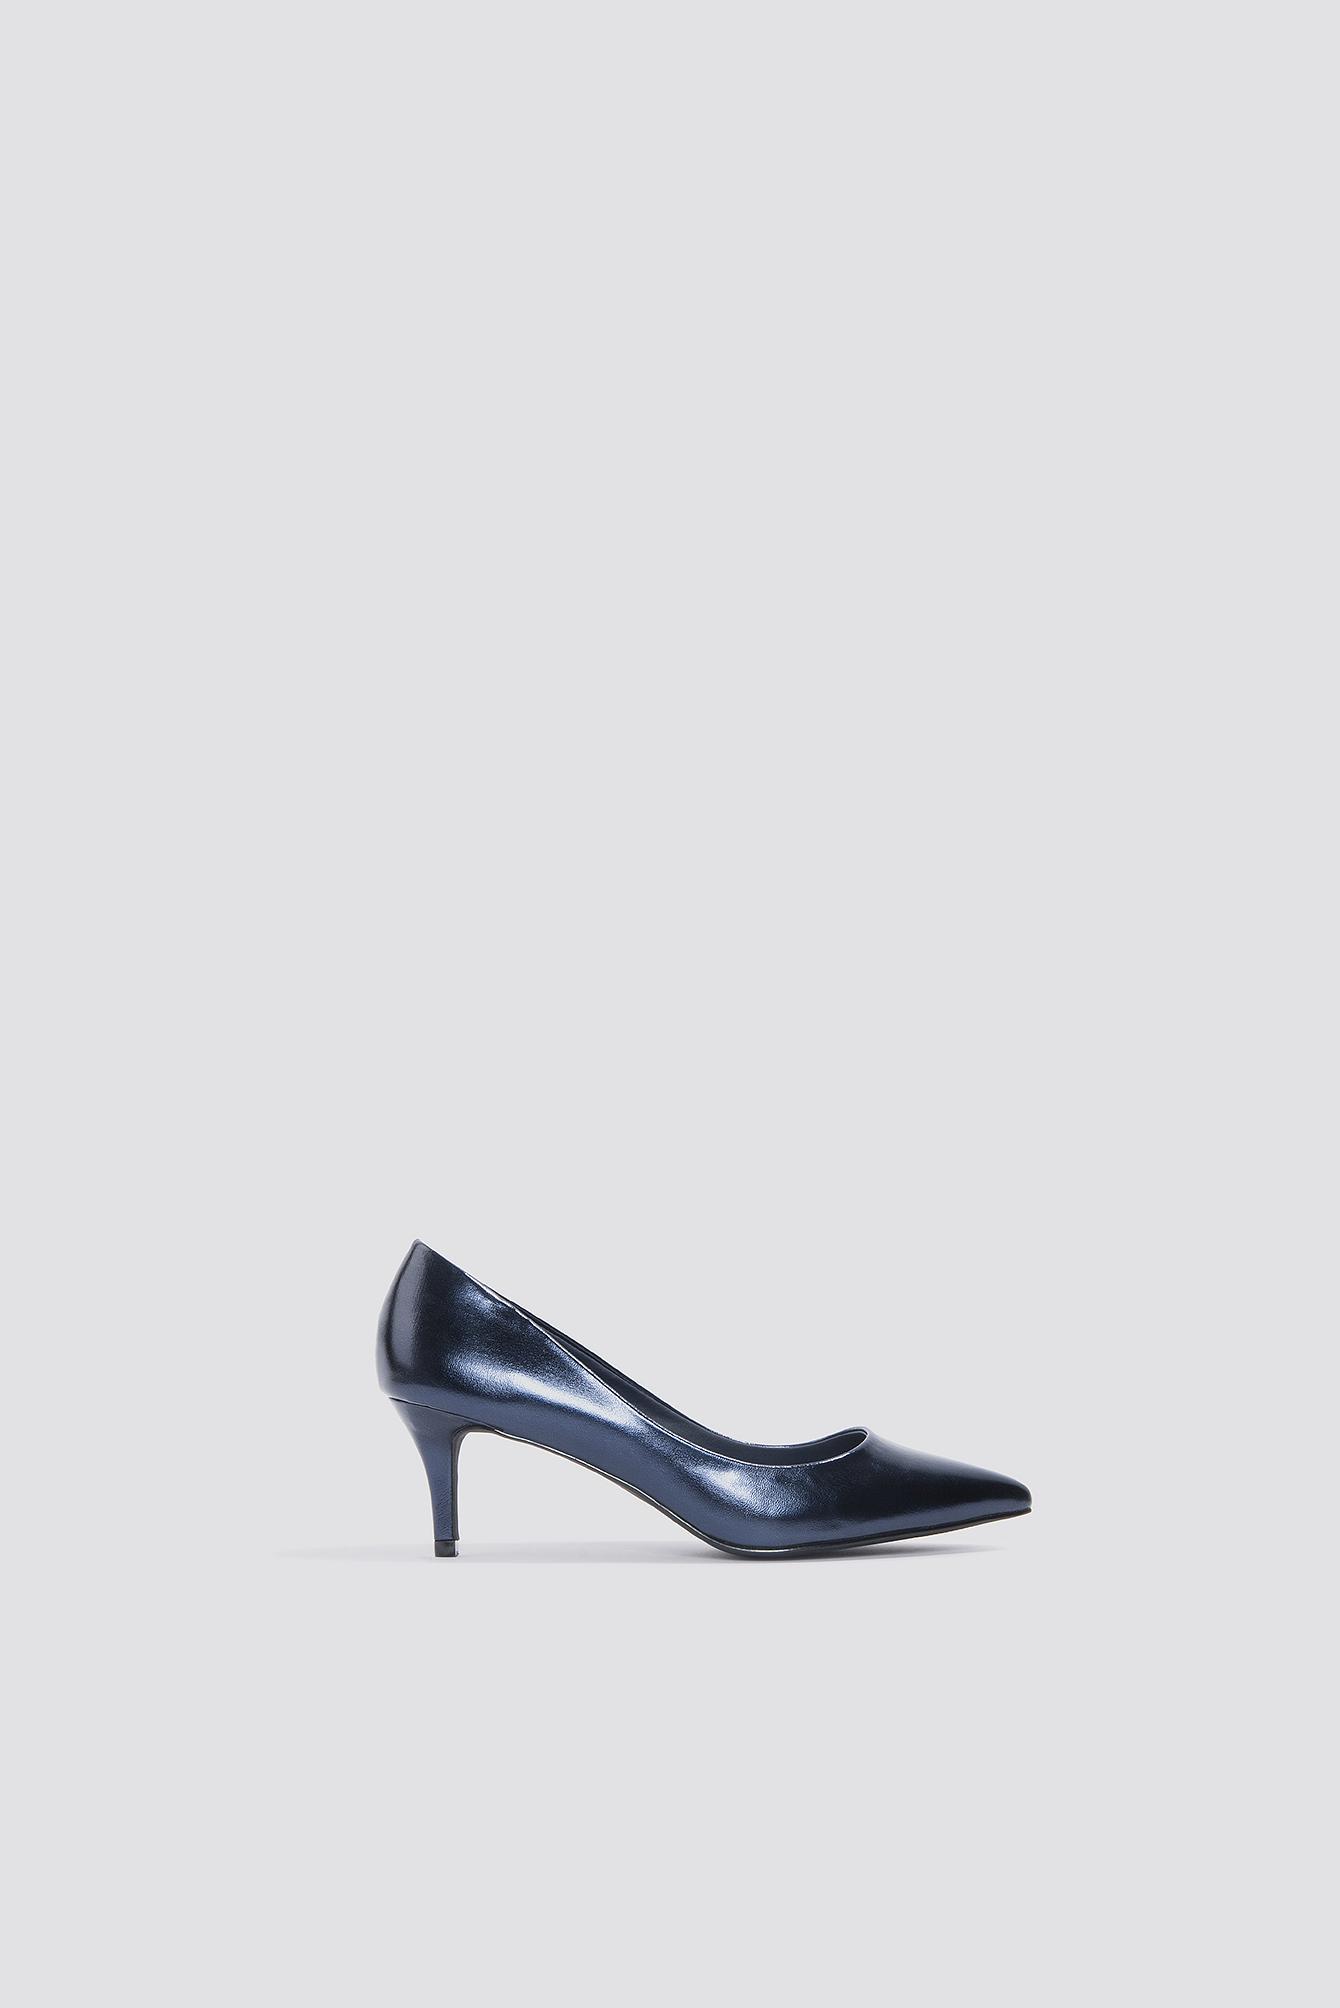 8e869b77c0 Na-Kd Metallic Mid Heel Pumps - Blue | ModeSens